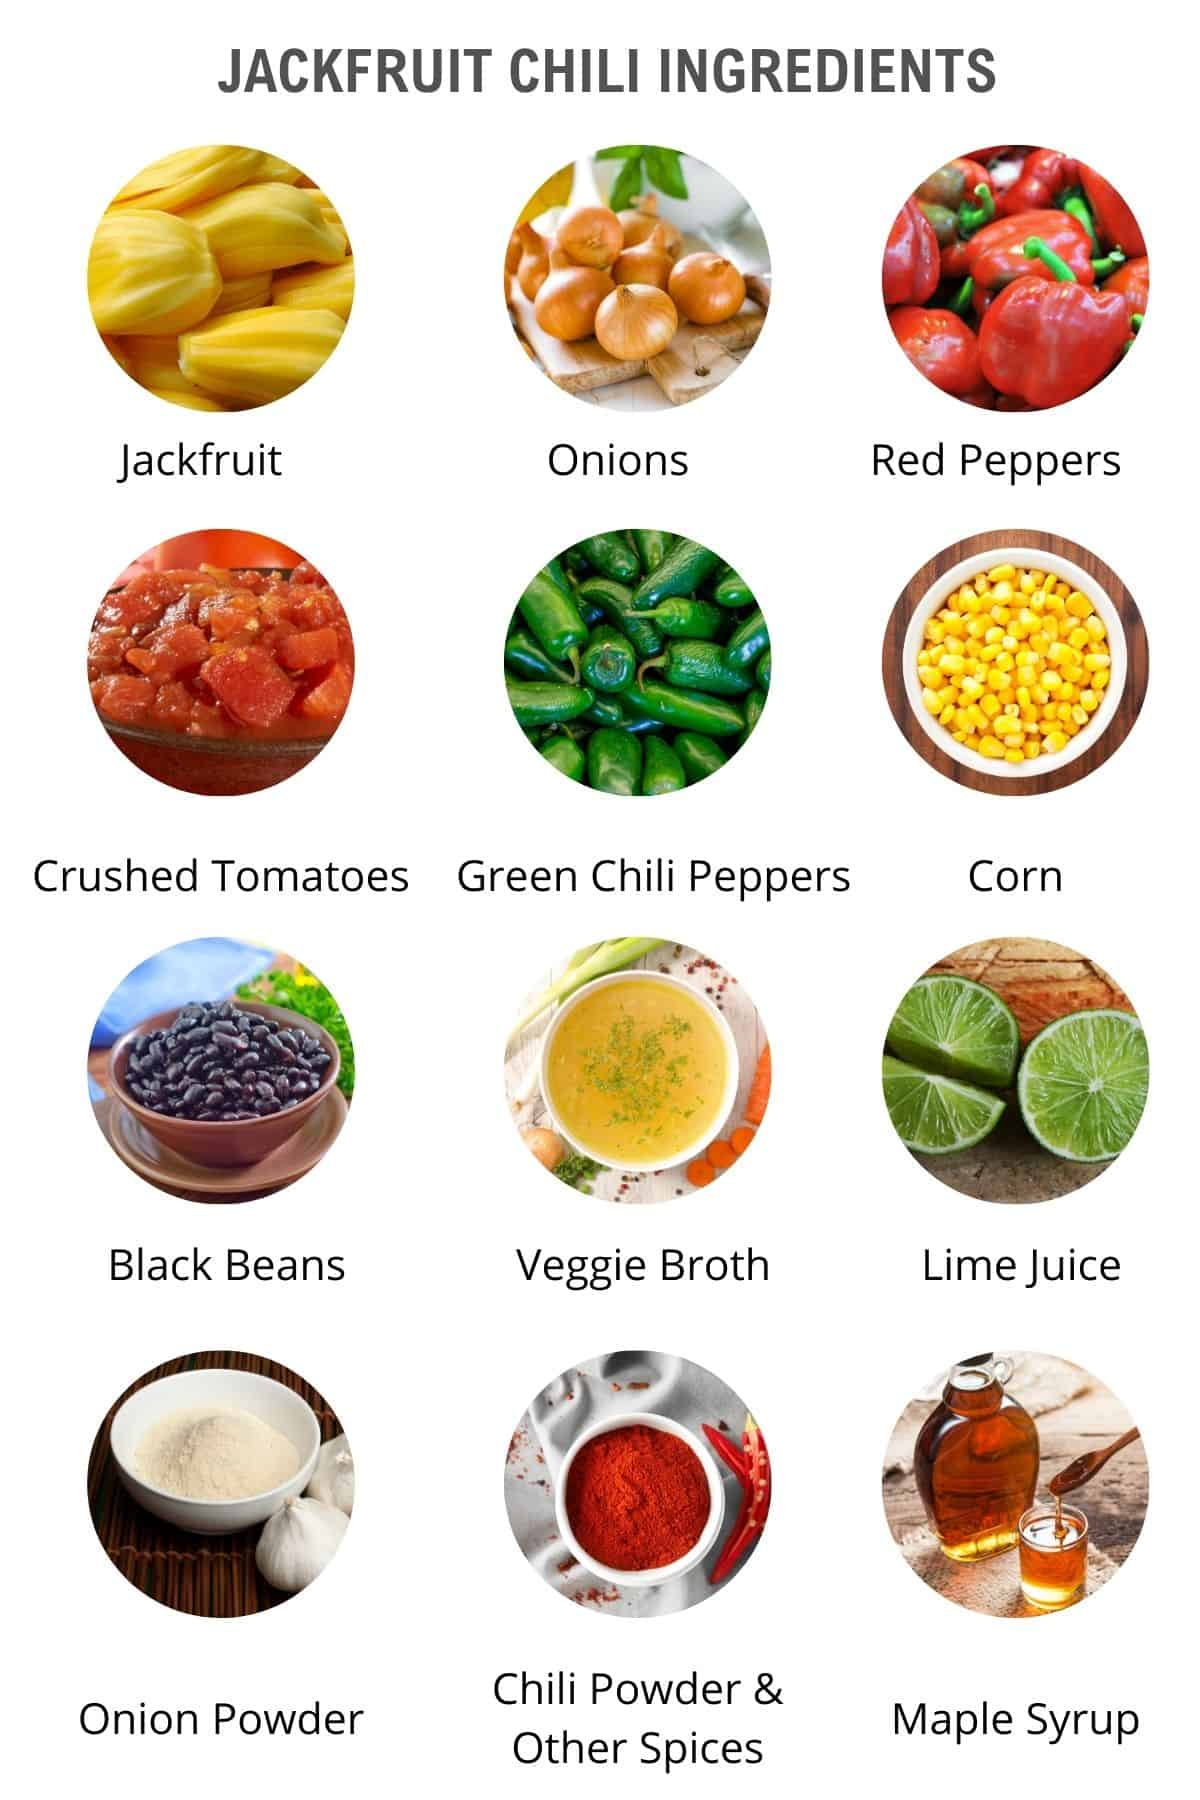 list of jackfruit chili ingredients